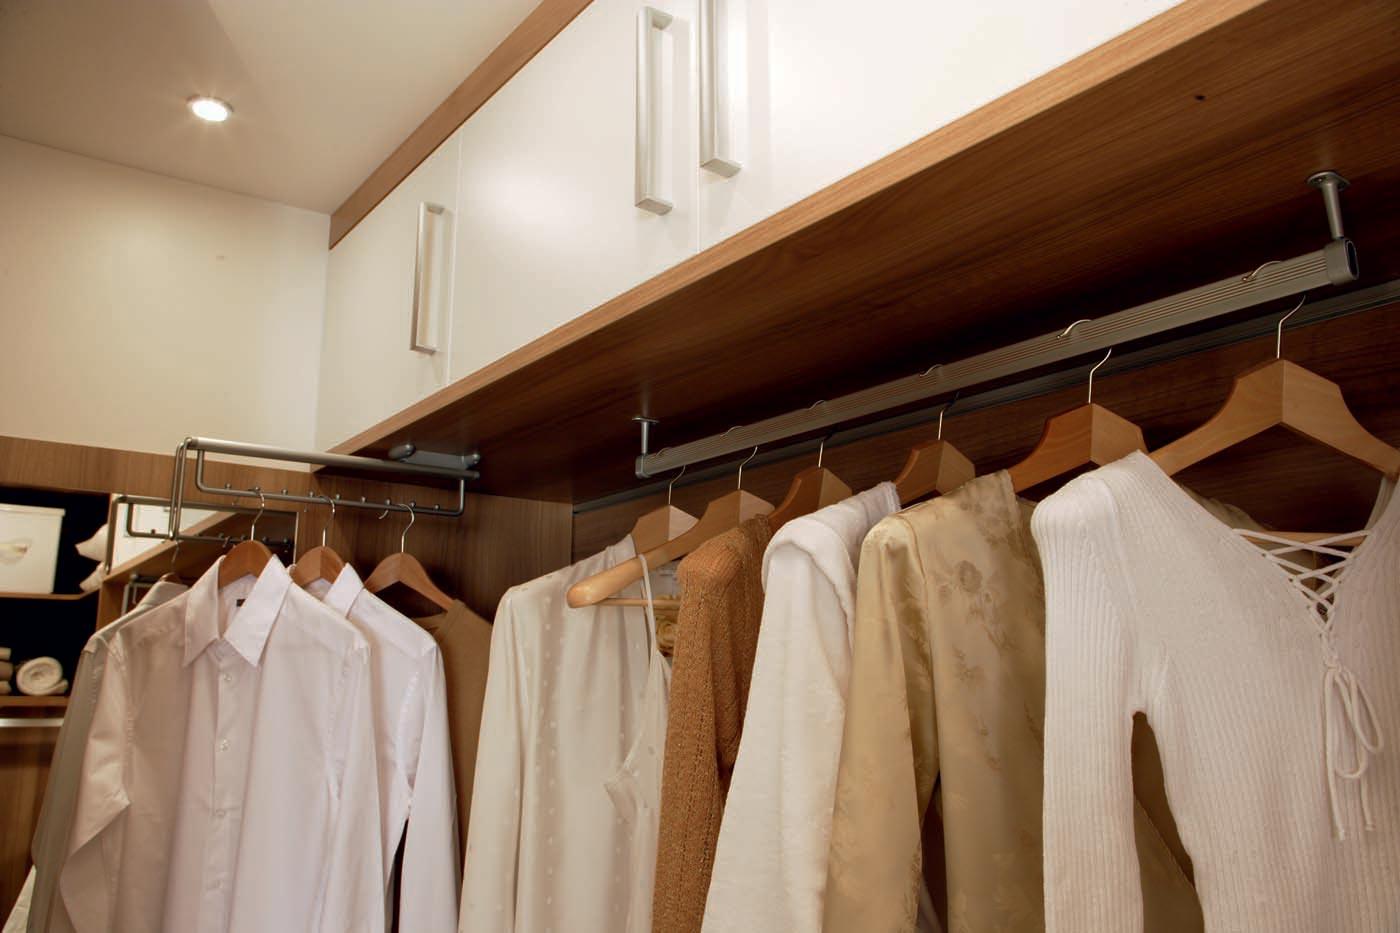 cuisine dressing irr sistible perene lyon. Black Bedroom Furniture Sets. Home Design Ideas